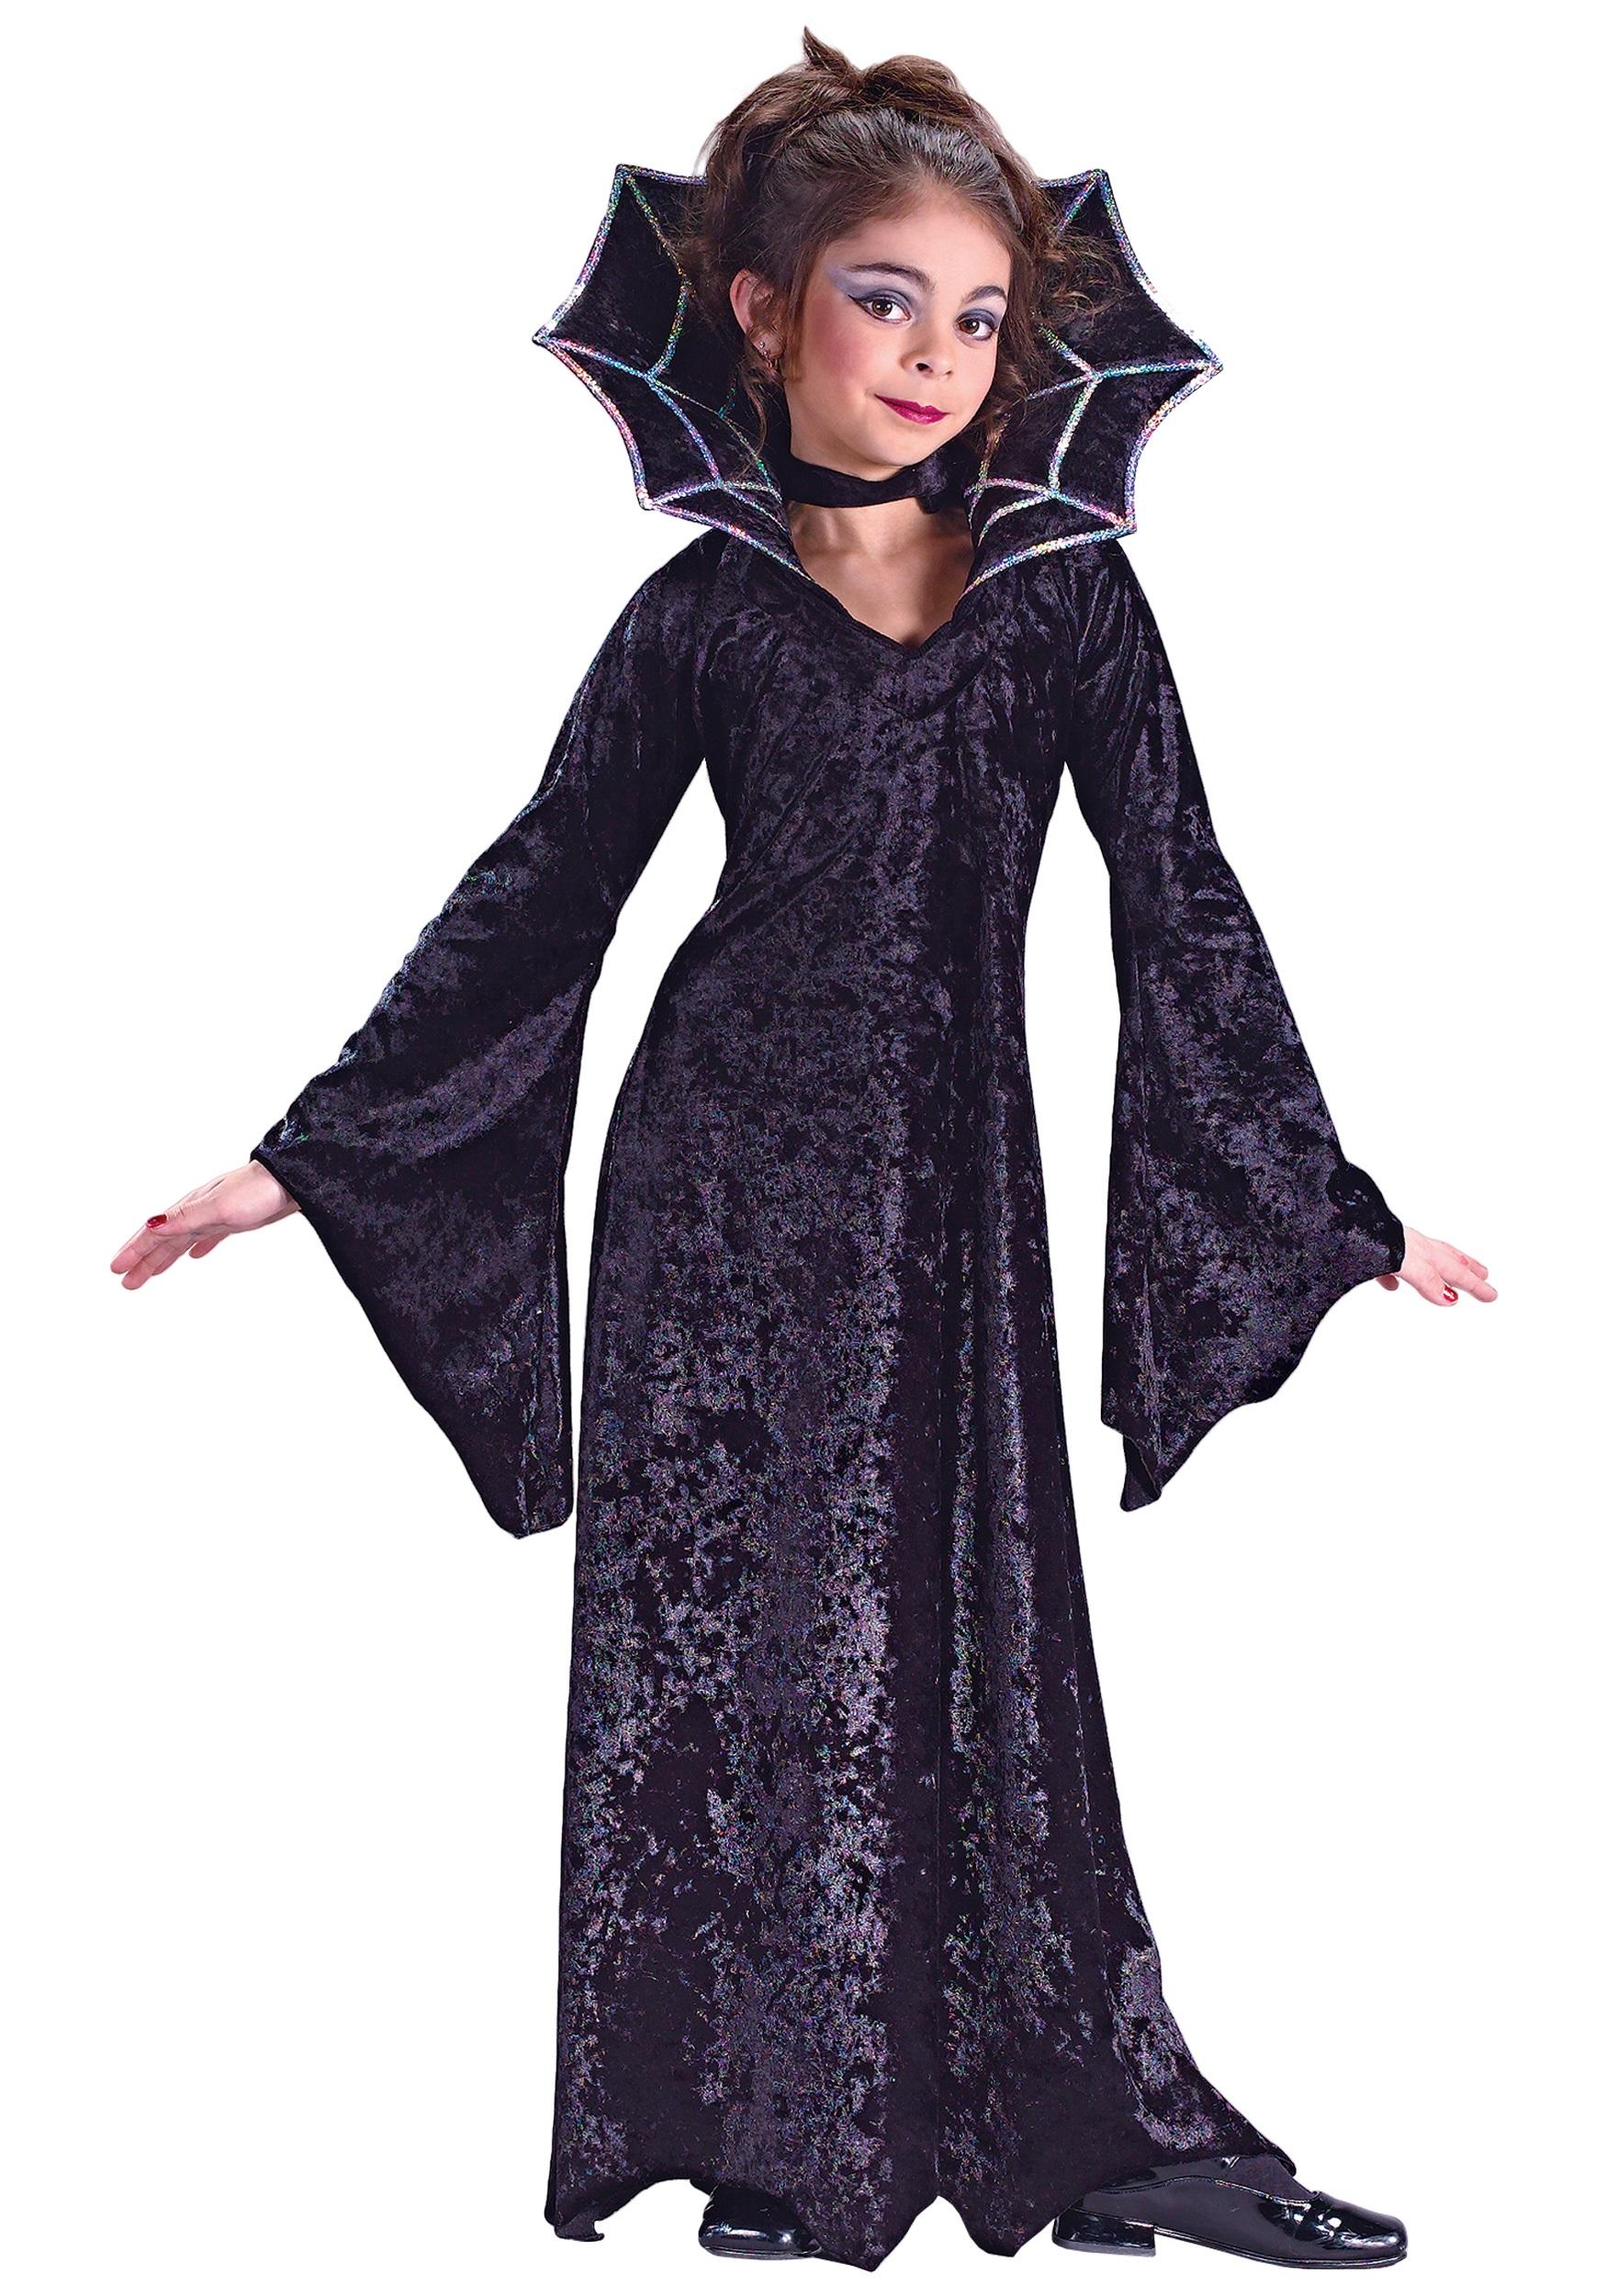 Child spiderella costume - Halloween schminkideen ...